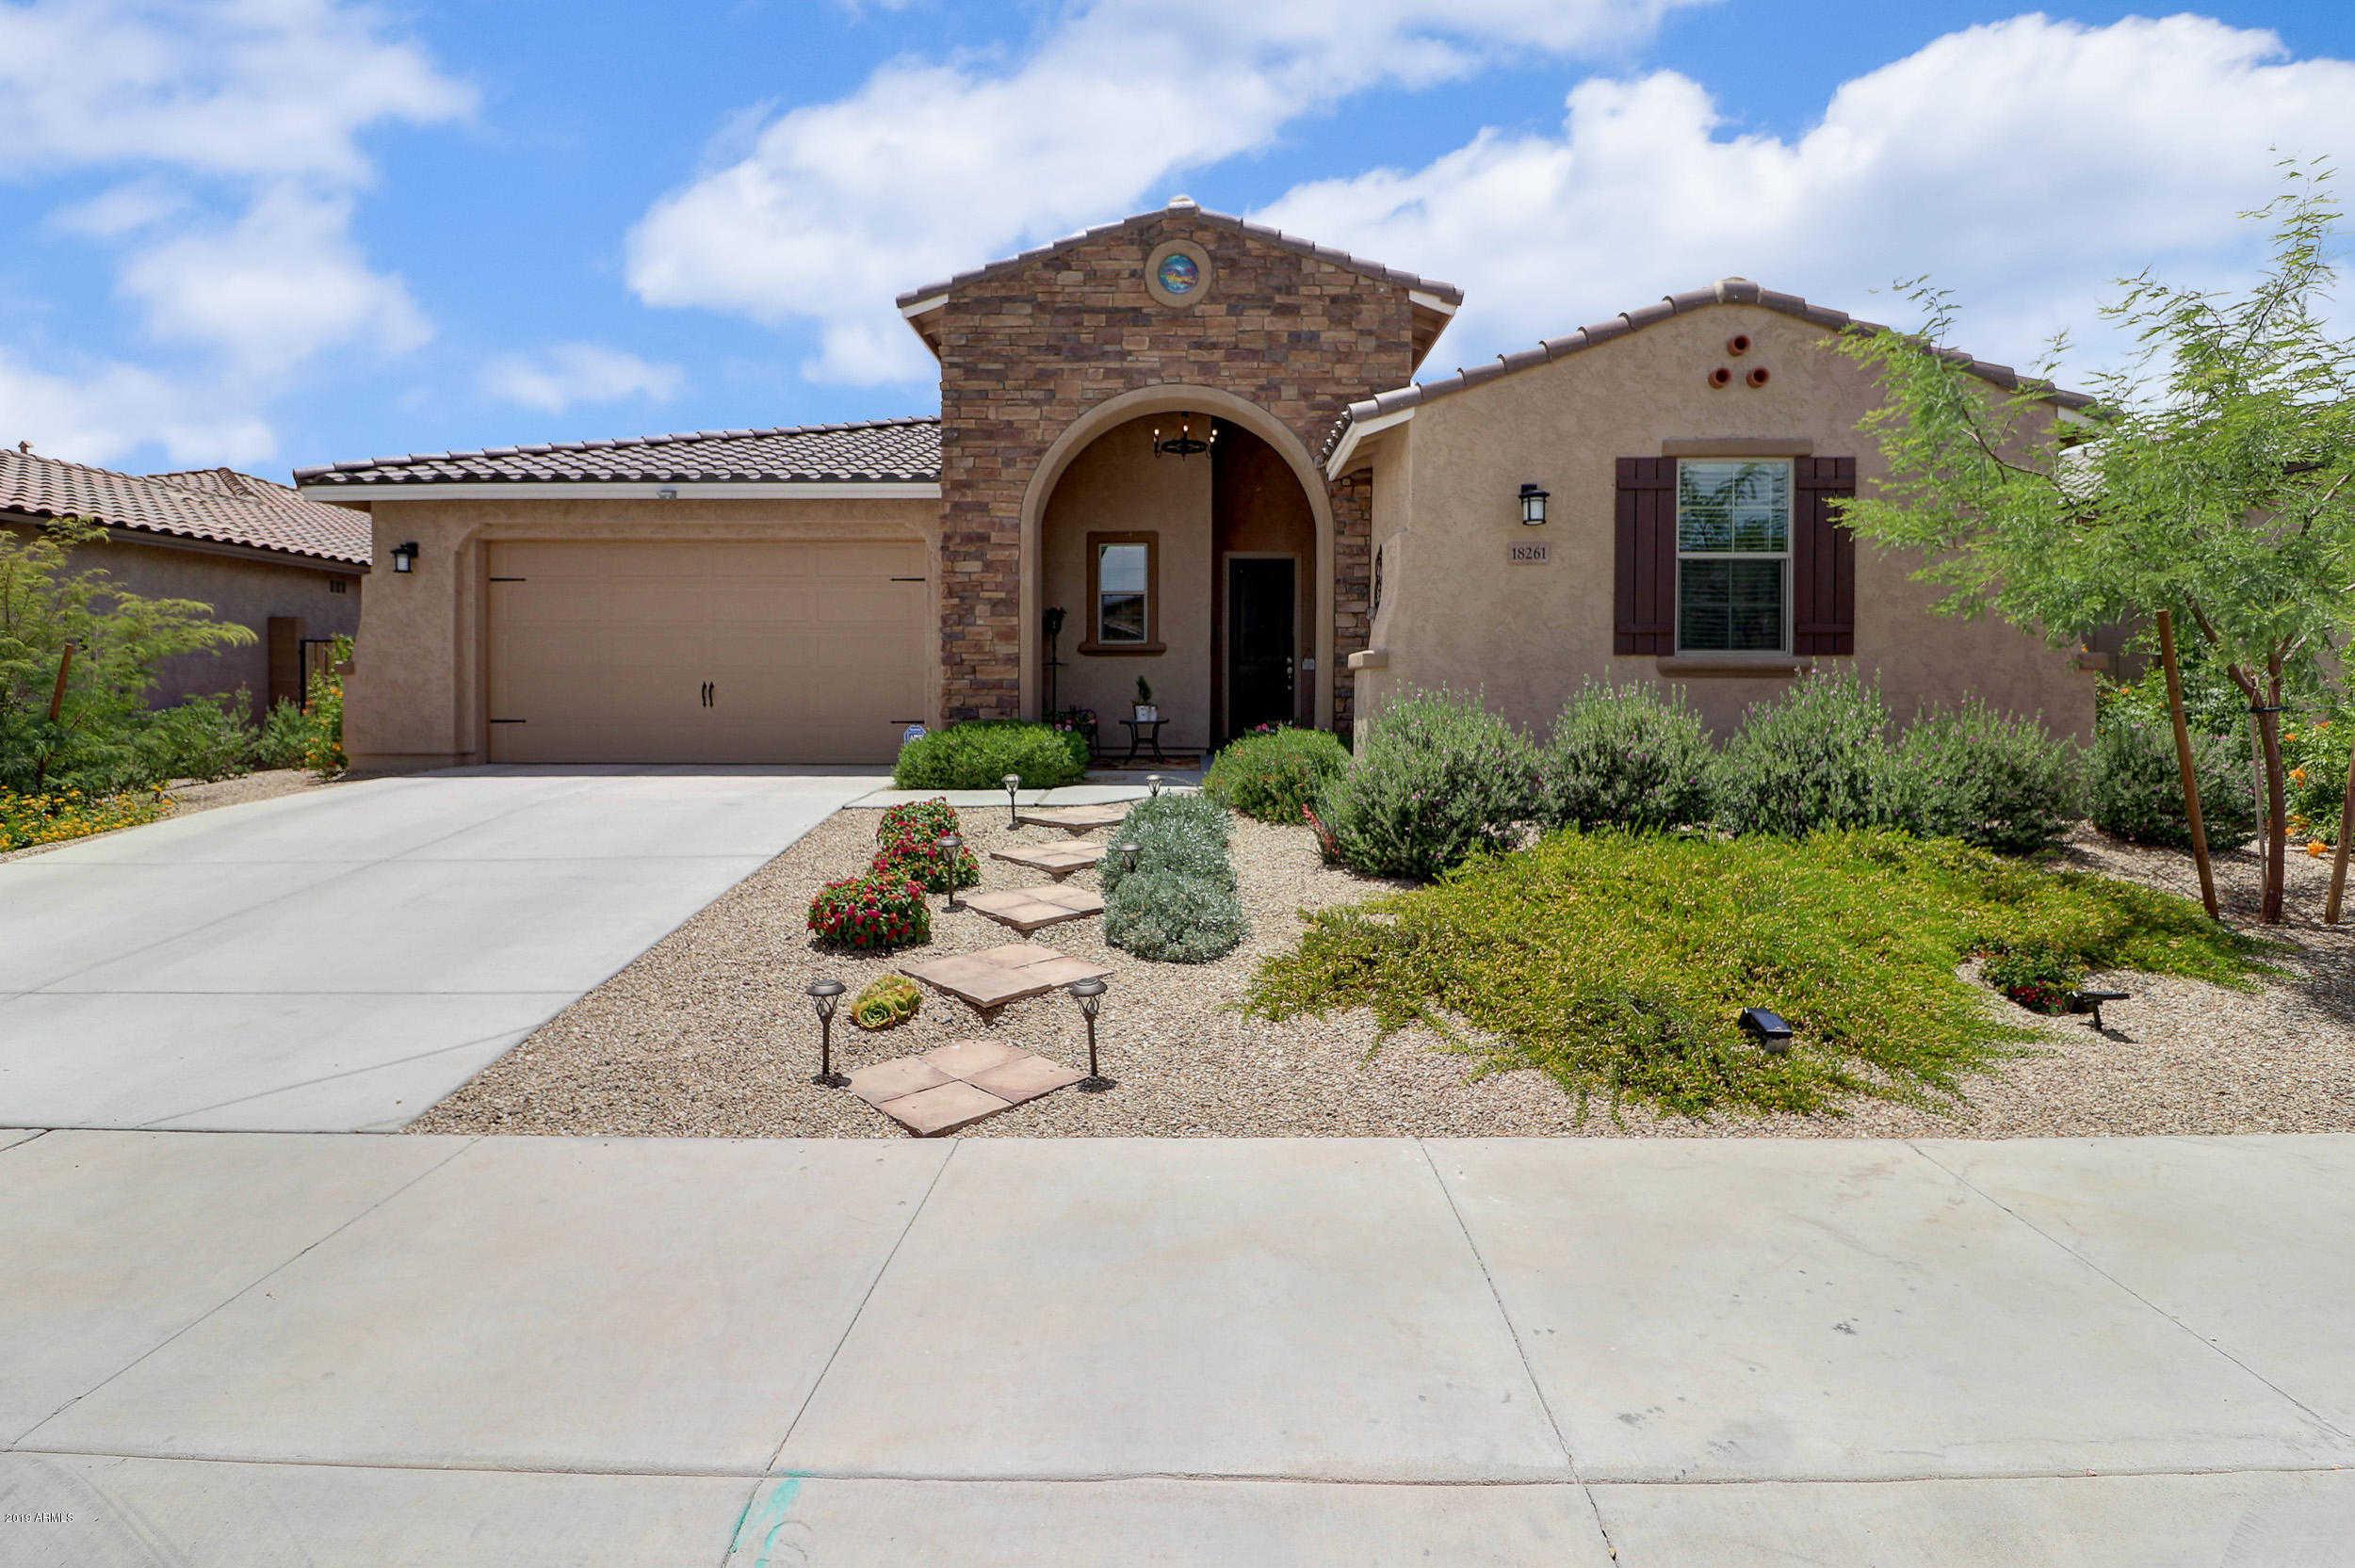 $342,900 - 3Br/2Ba - Home for Sale in Montecito Village At Estrella Mtn Ranch Parel 9.5, Goodyear